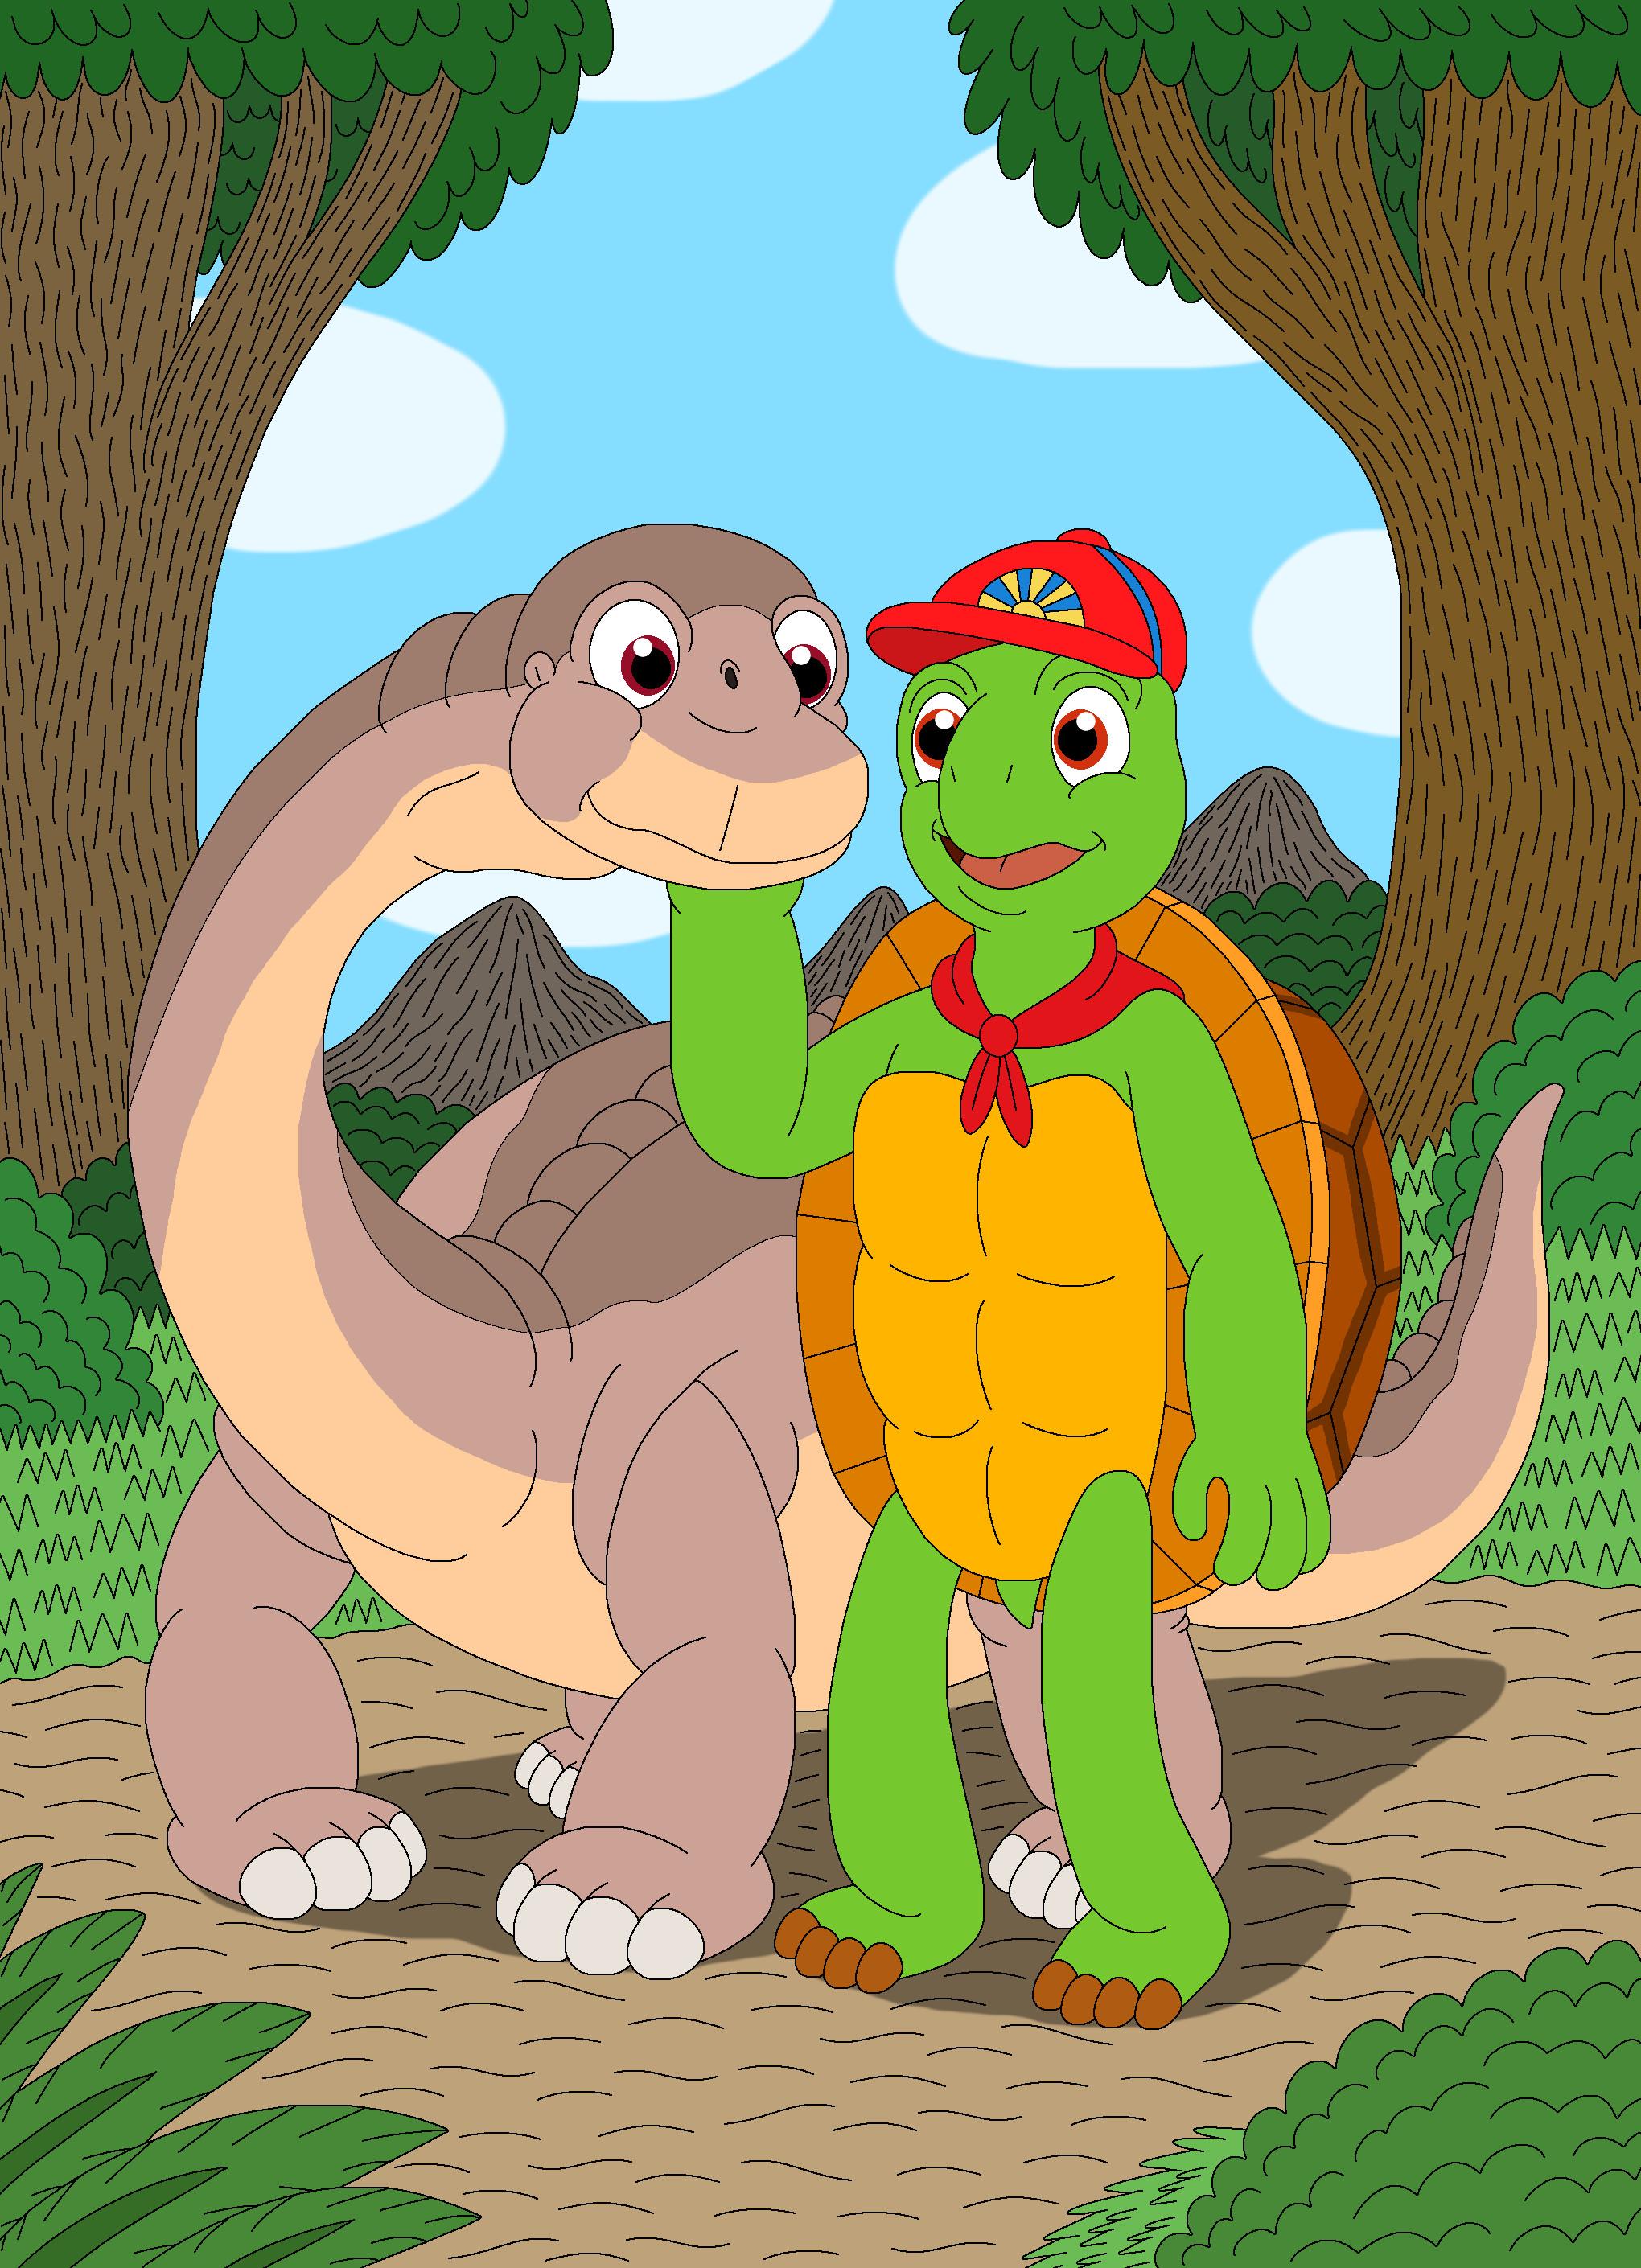 Uncategorized Cartoon Franklin franklin befriends littlefoot by mcsaurus on deviantart mcsaurus